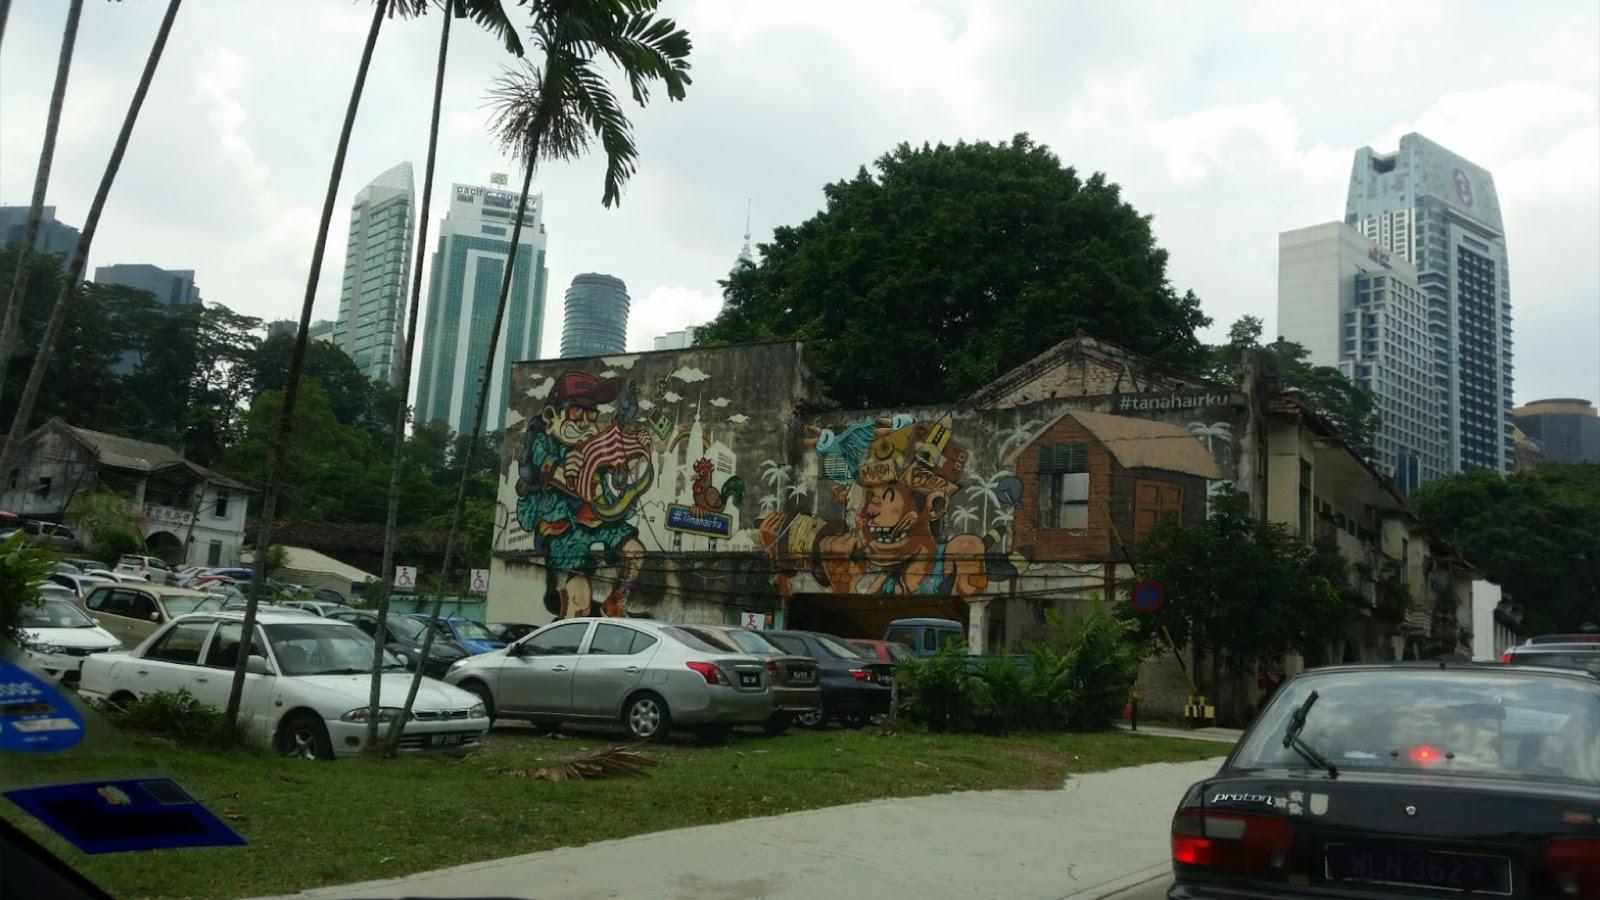 Cerita saya cerita awak cerita kita for Mural yang cantik